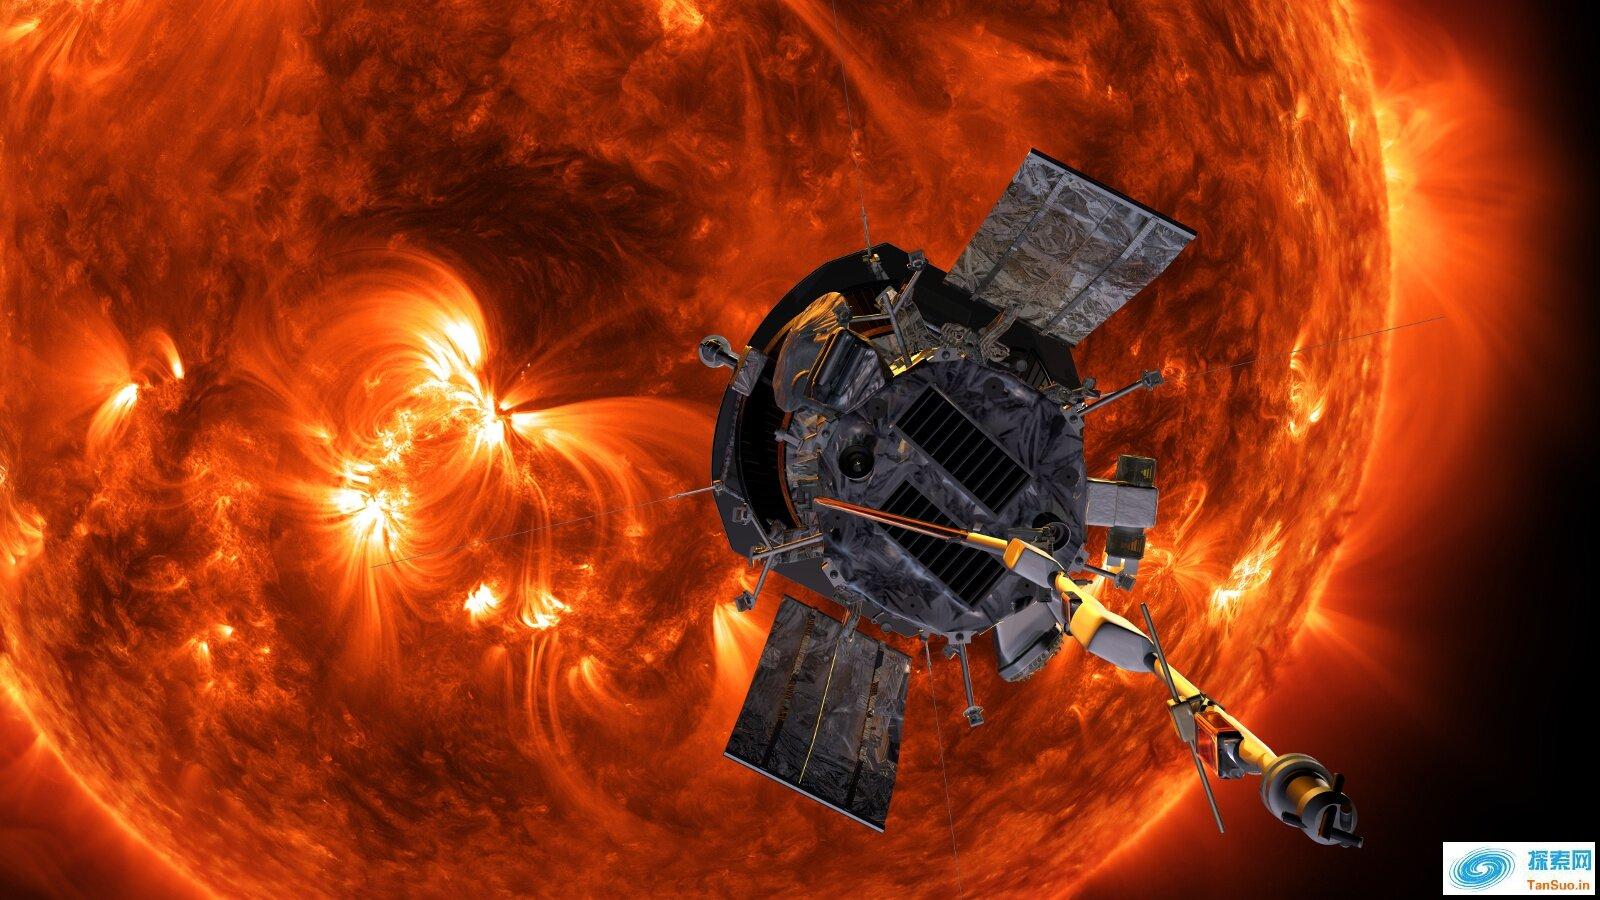 NASA 准备好发射第一枚深入日冕的太空探测器了